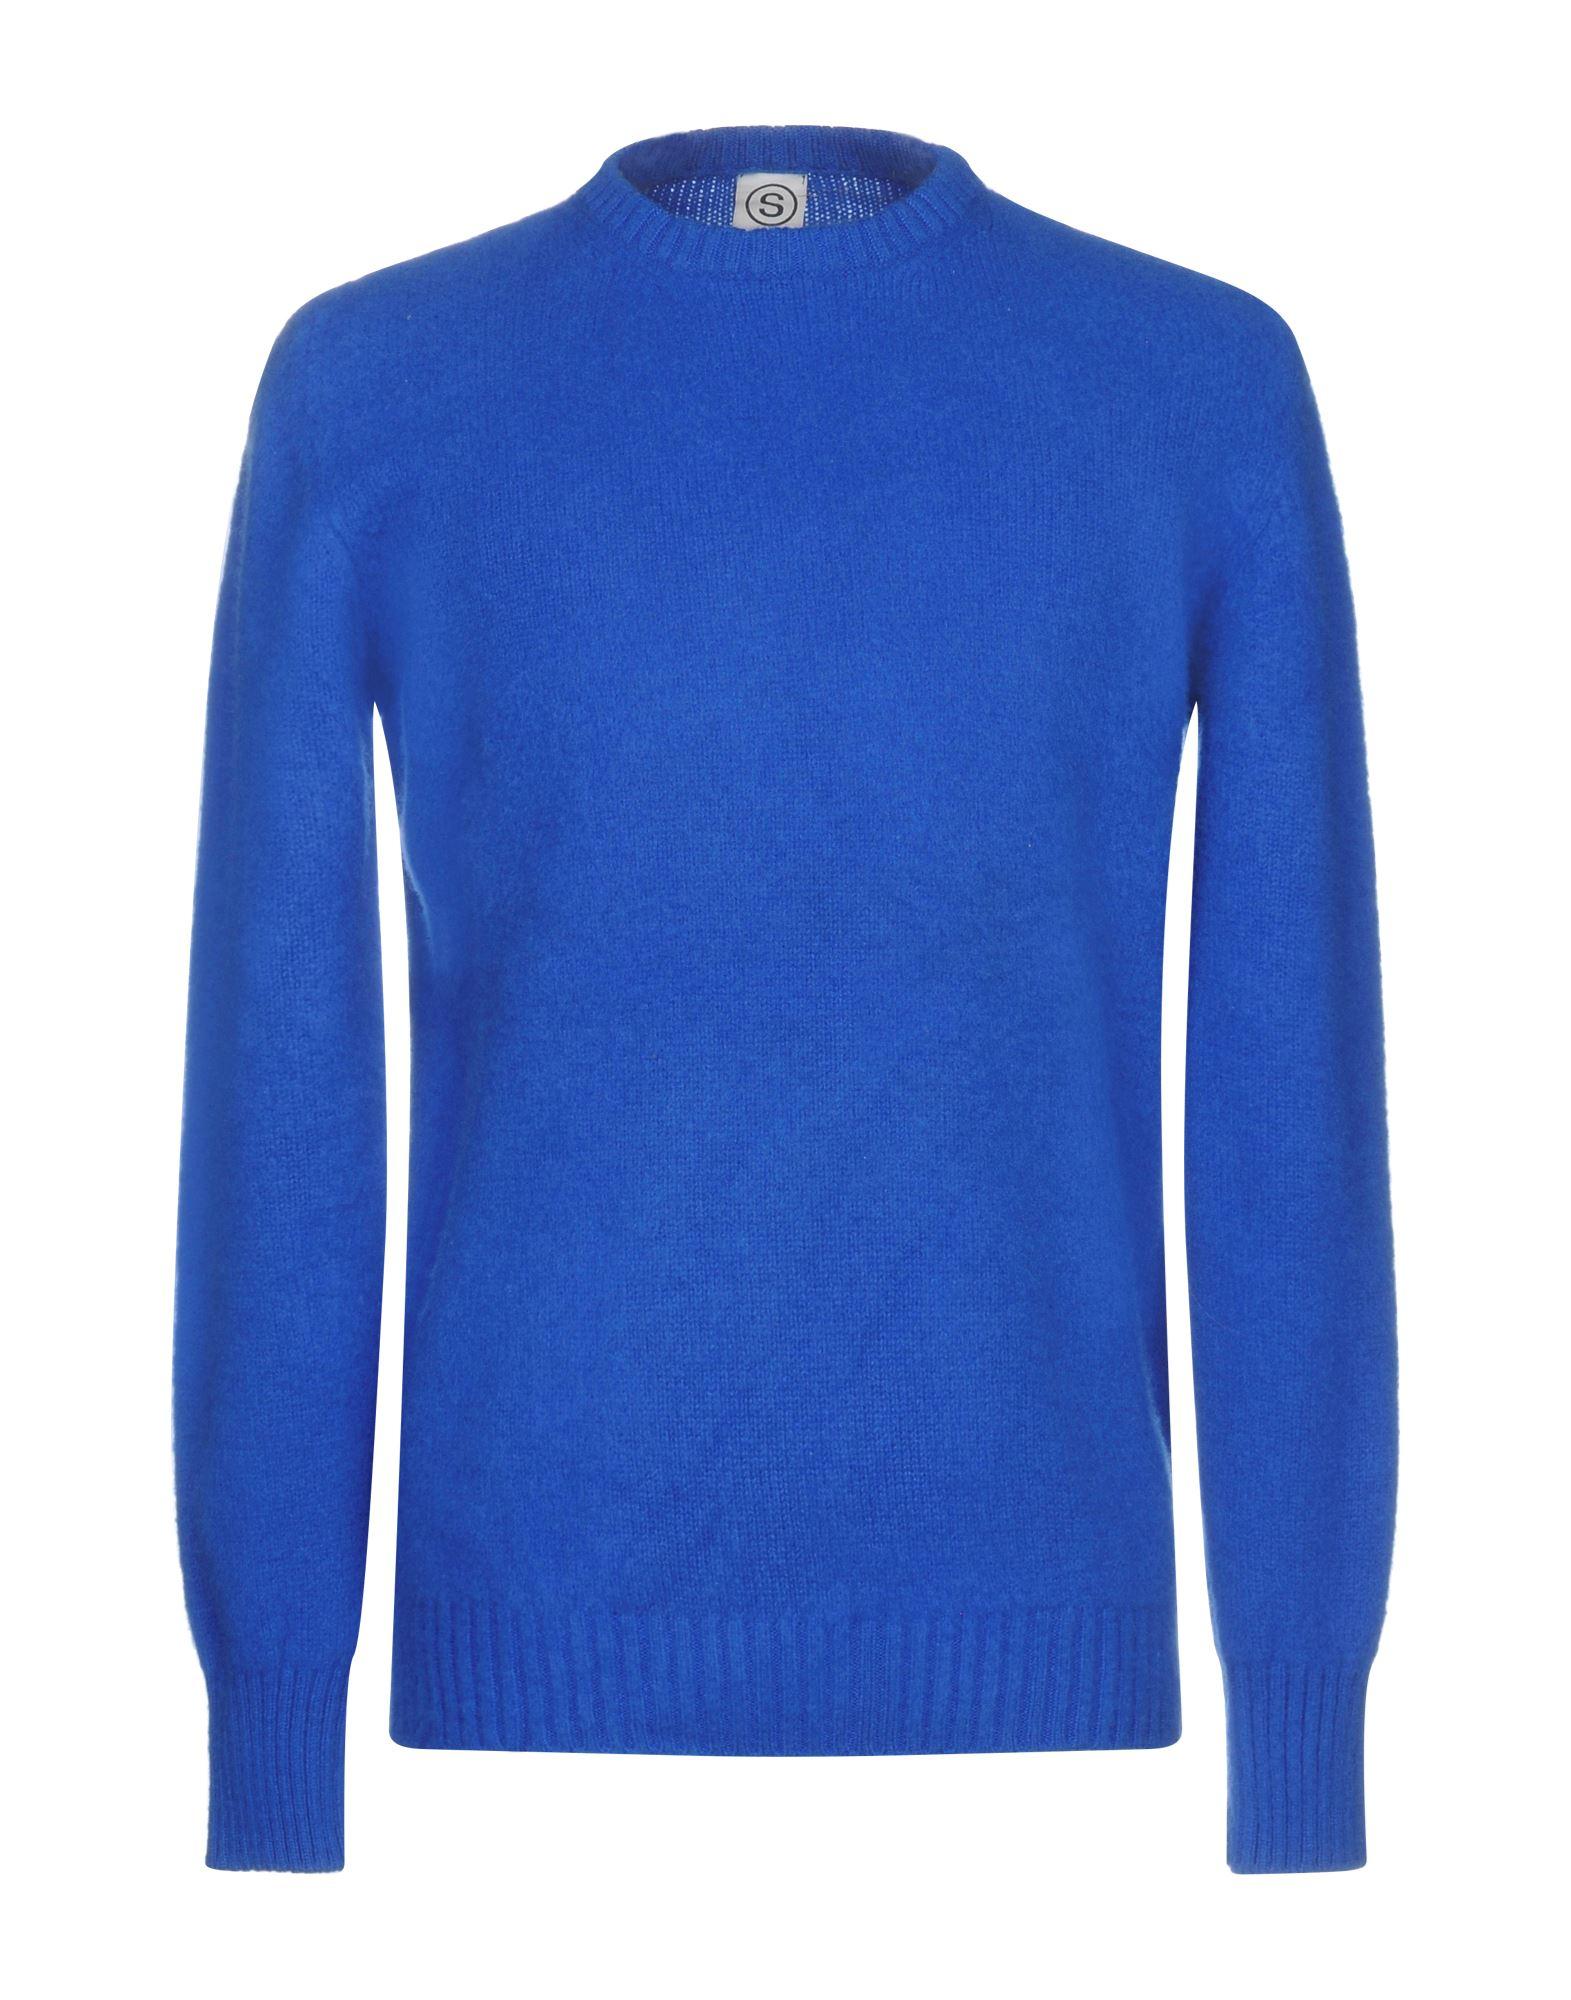 SOHO Sweater in Bright Blue